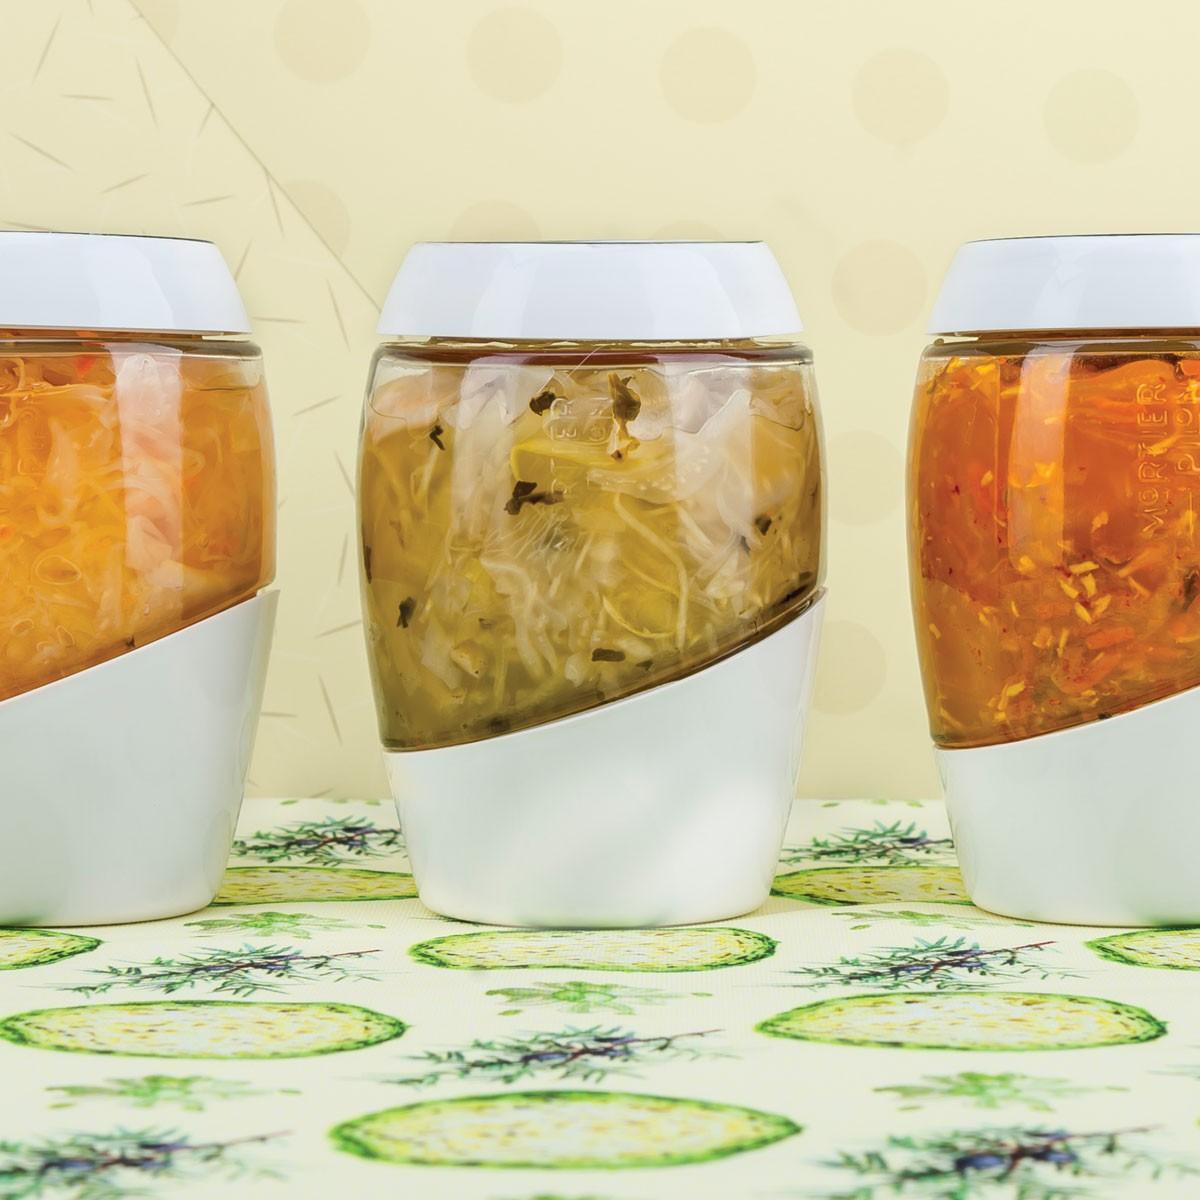 Mortier Pilon 2 Liter Kimchi Fermentation Crock